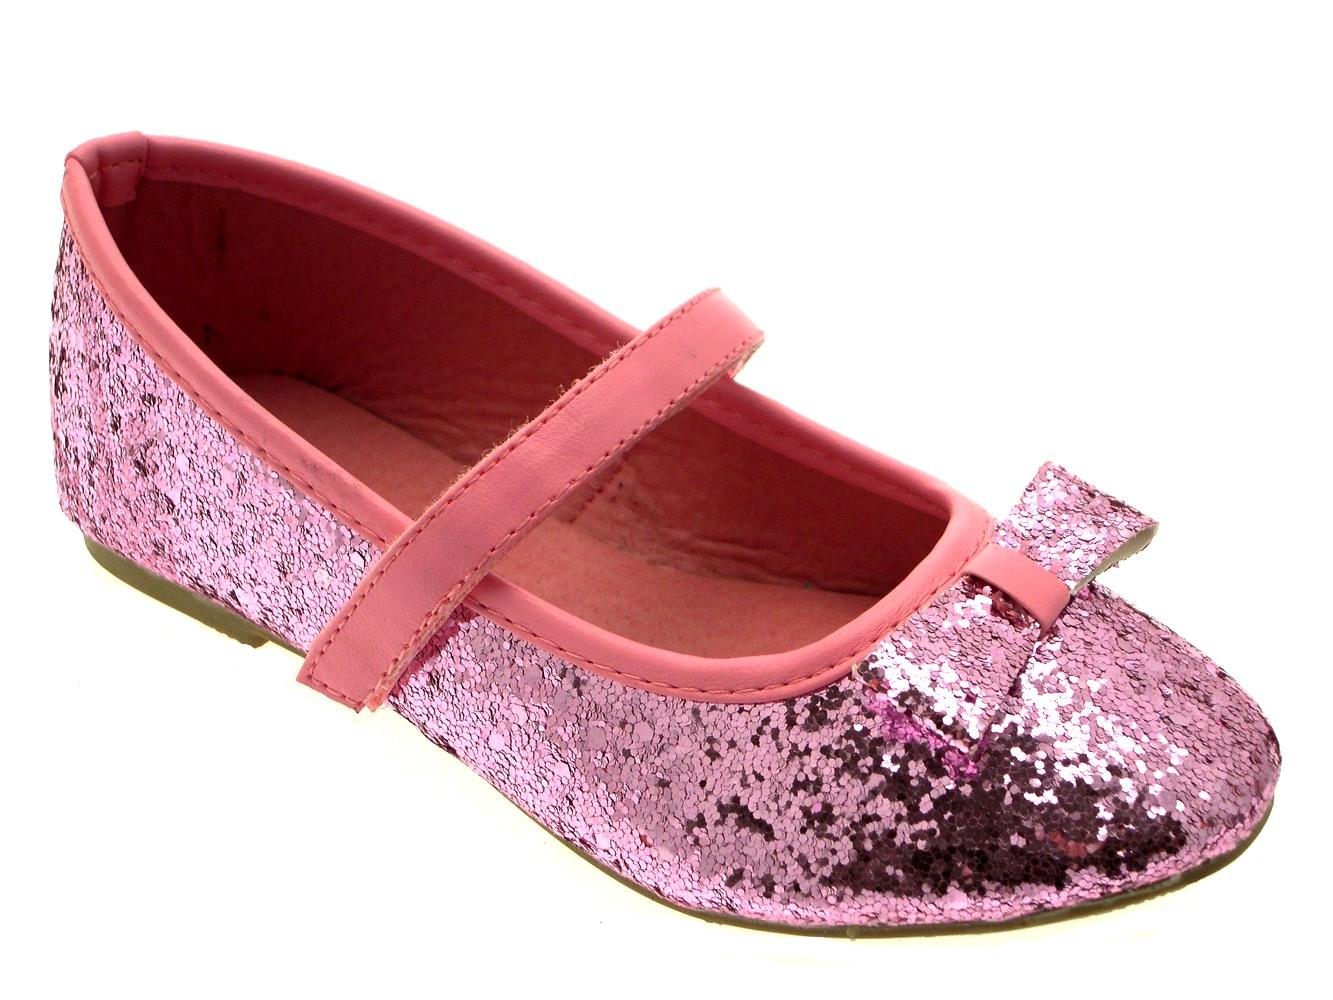 Bow ballet pumps flat childrens kids shoes wedding party size 4 12